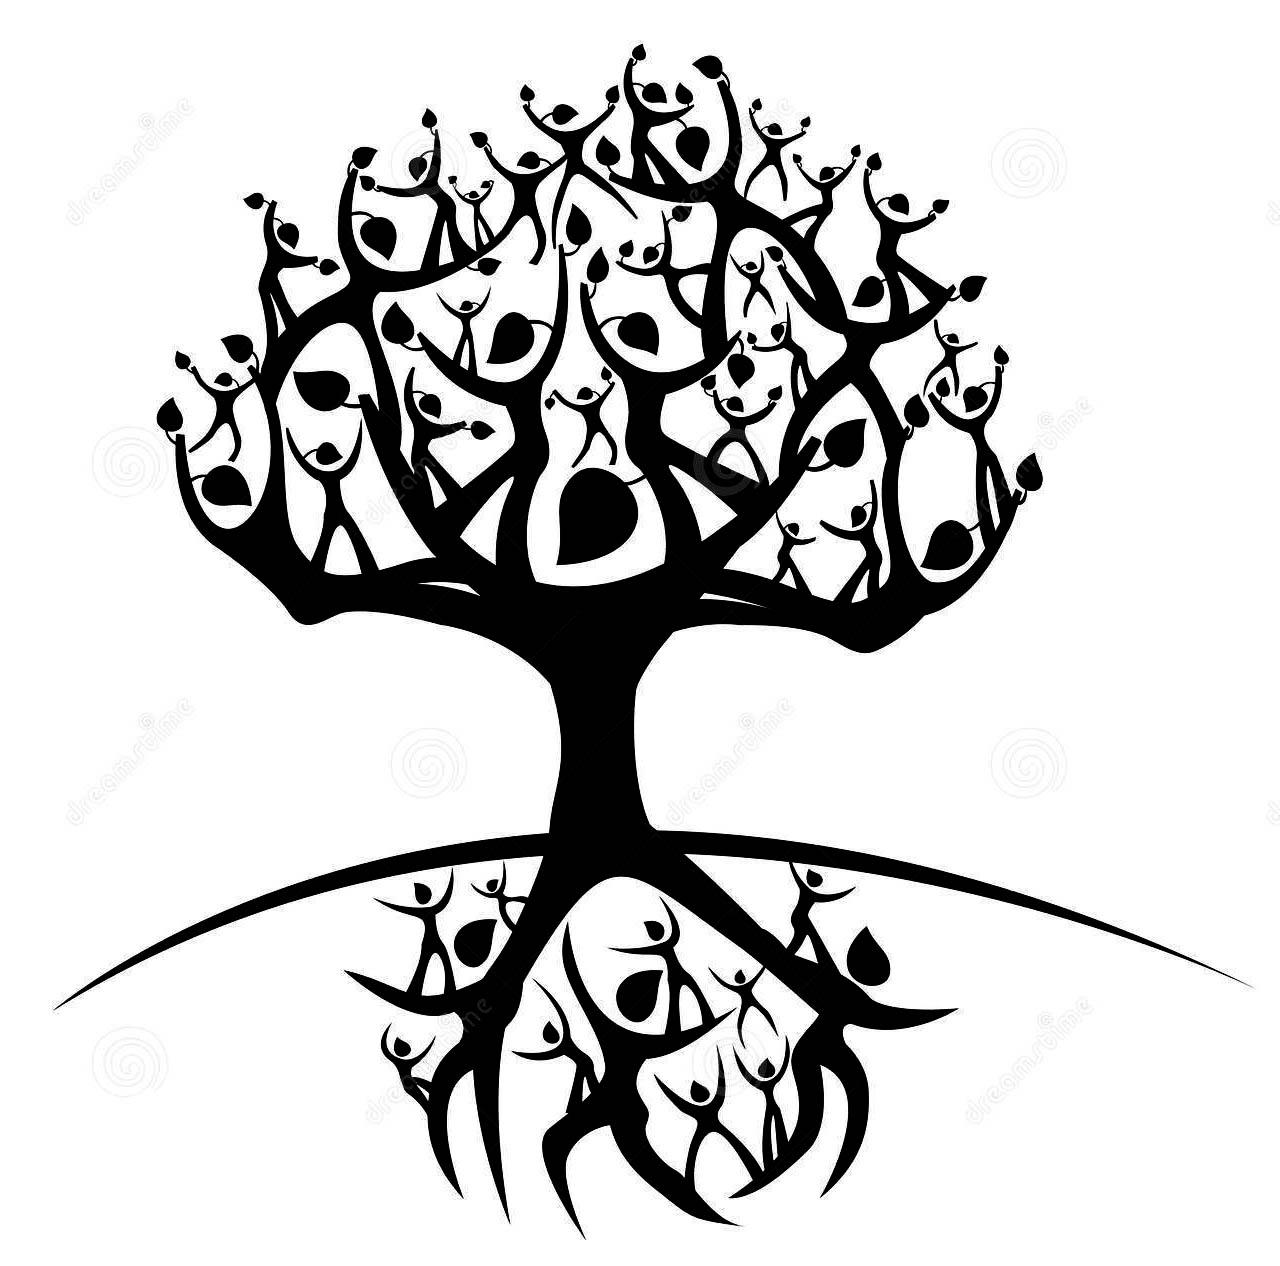 Family Tree Tattoo Drawing